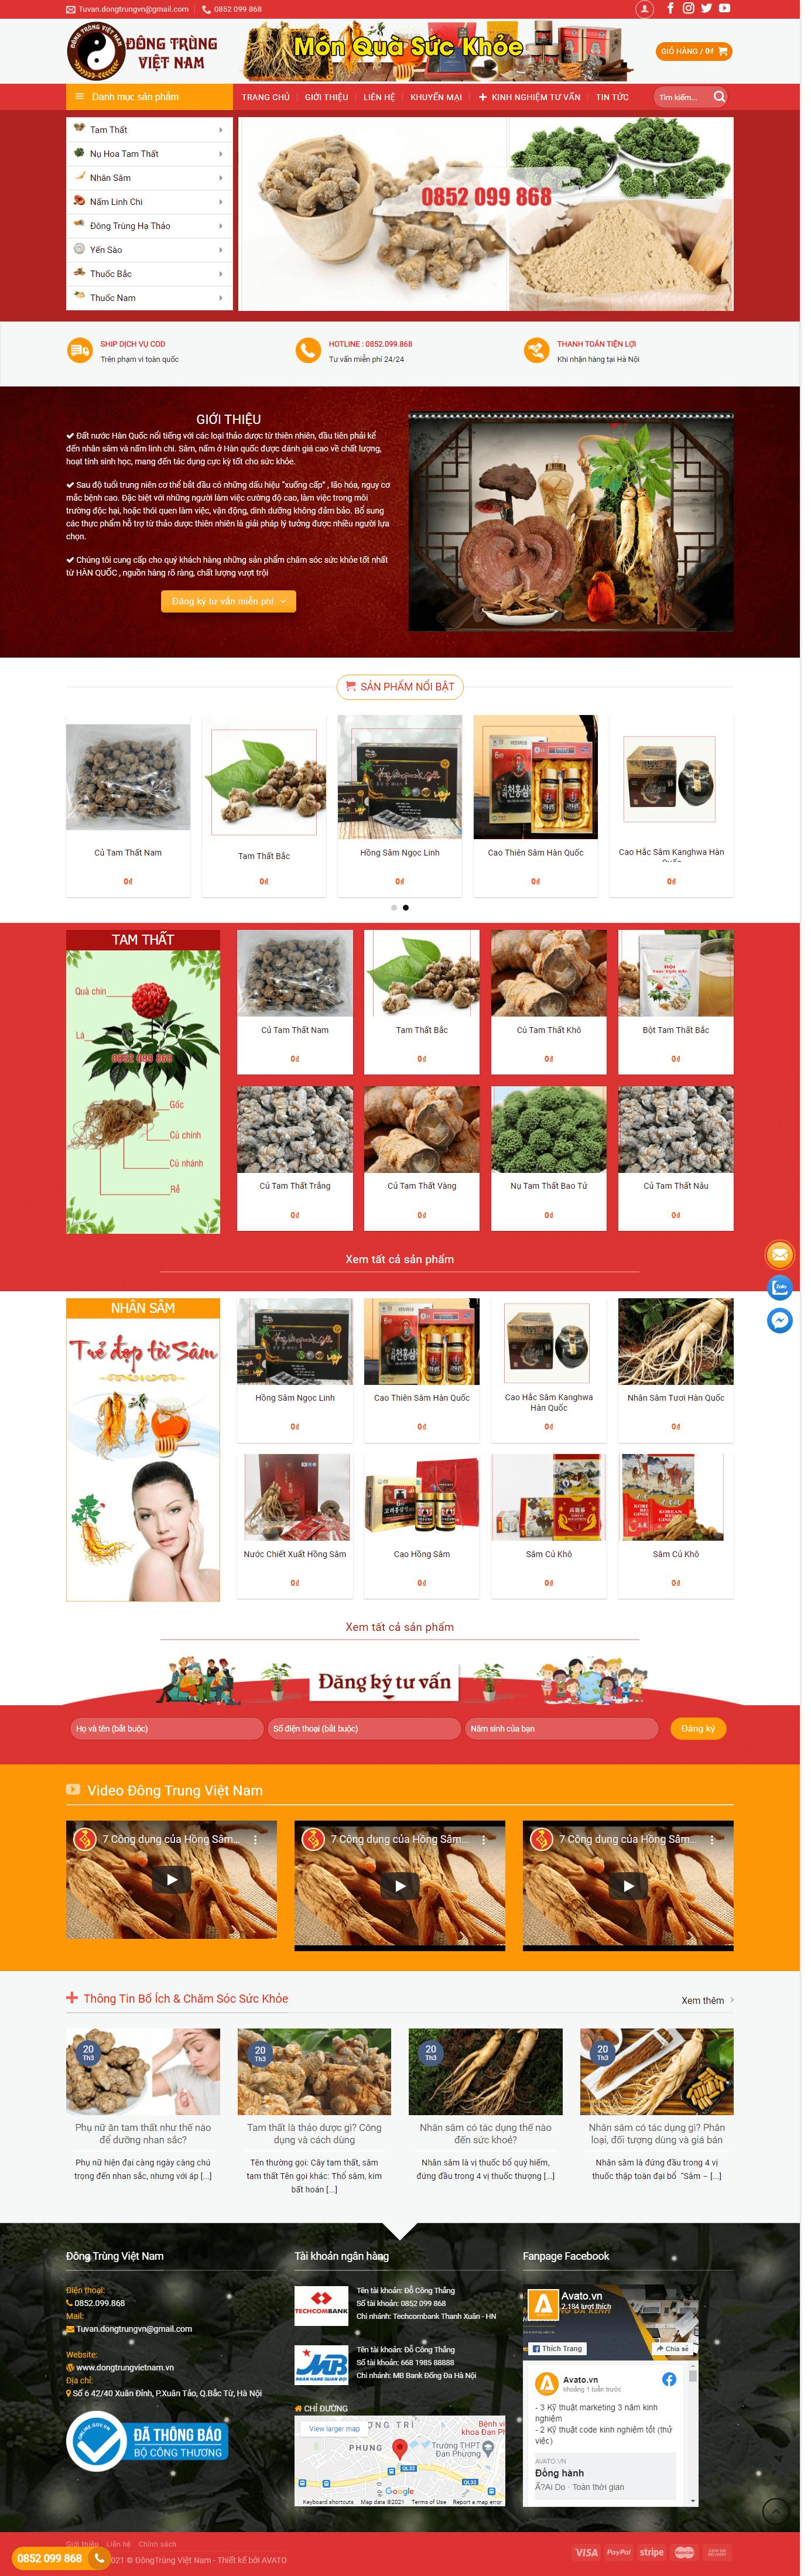 mau-website-dong-trung-ha-thao-viet-nam